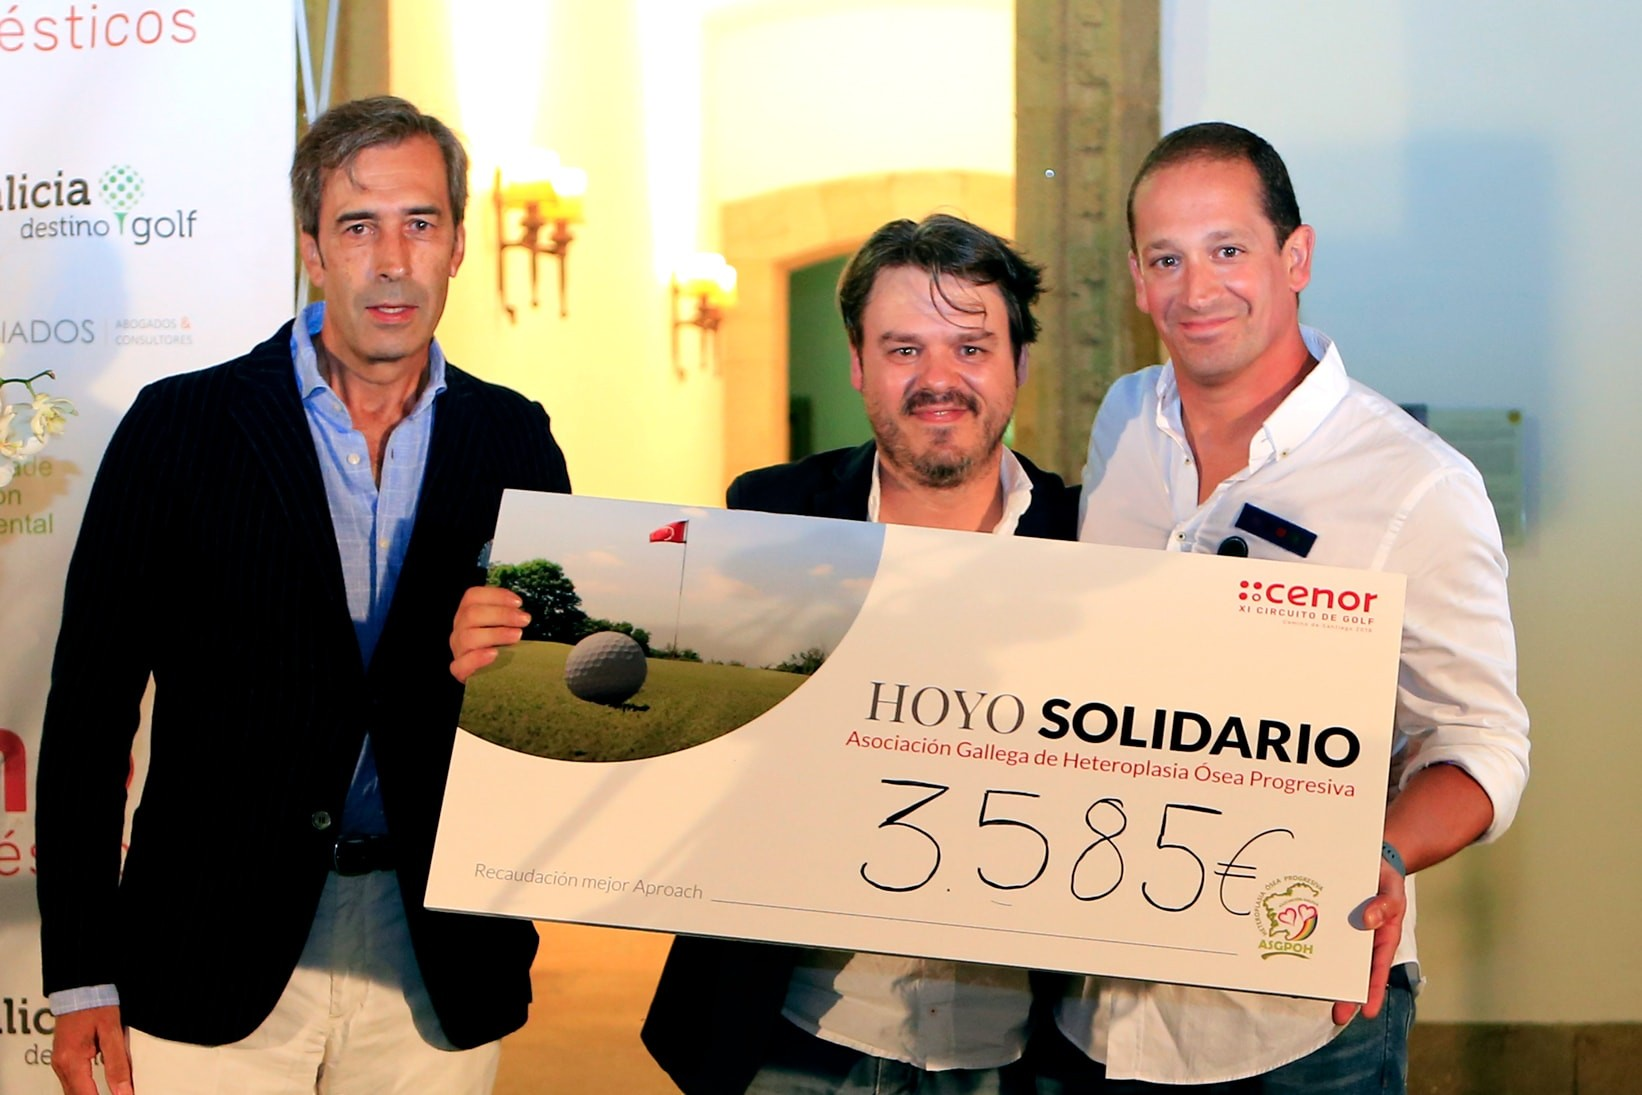 Circuito-Golf-Ceno-Hjoyo-Solidario-ASGPOH-Heteroplasia-osea-progresiva-2018-.jpg